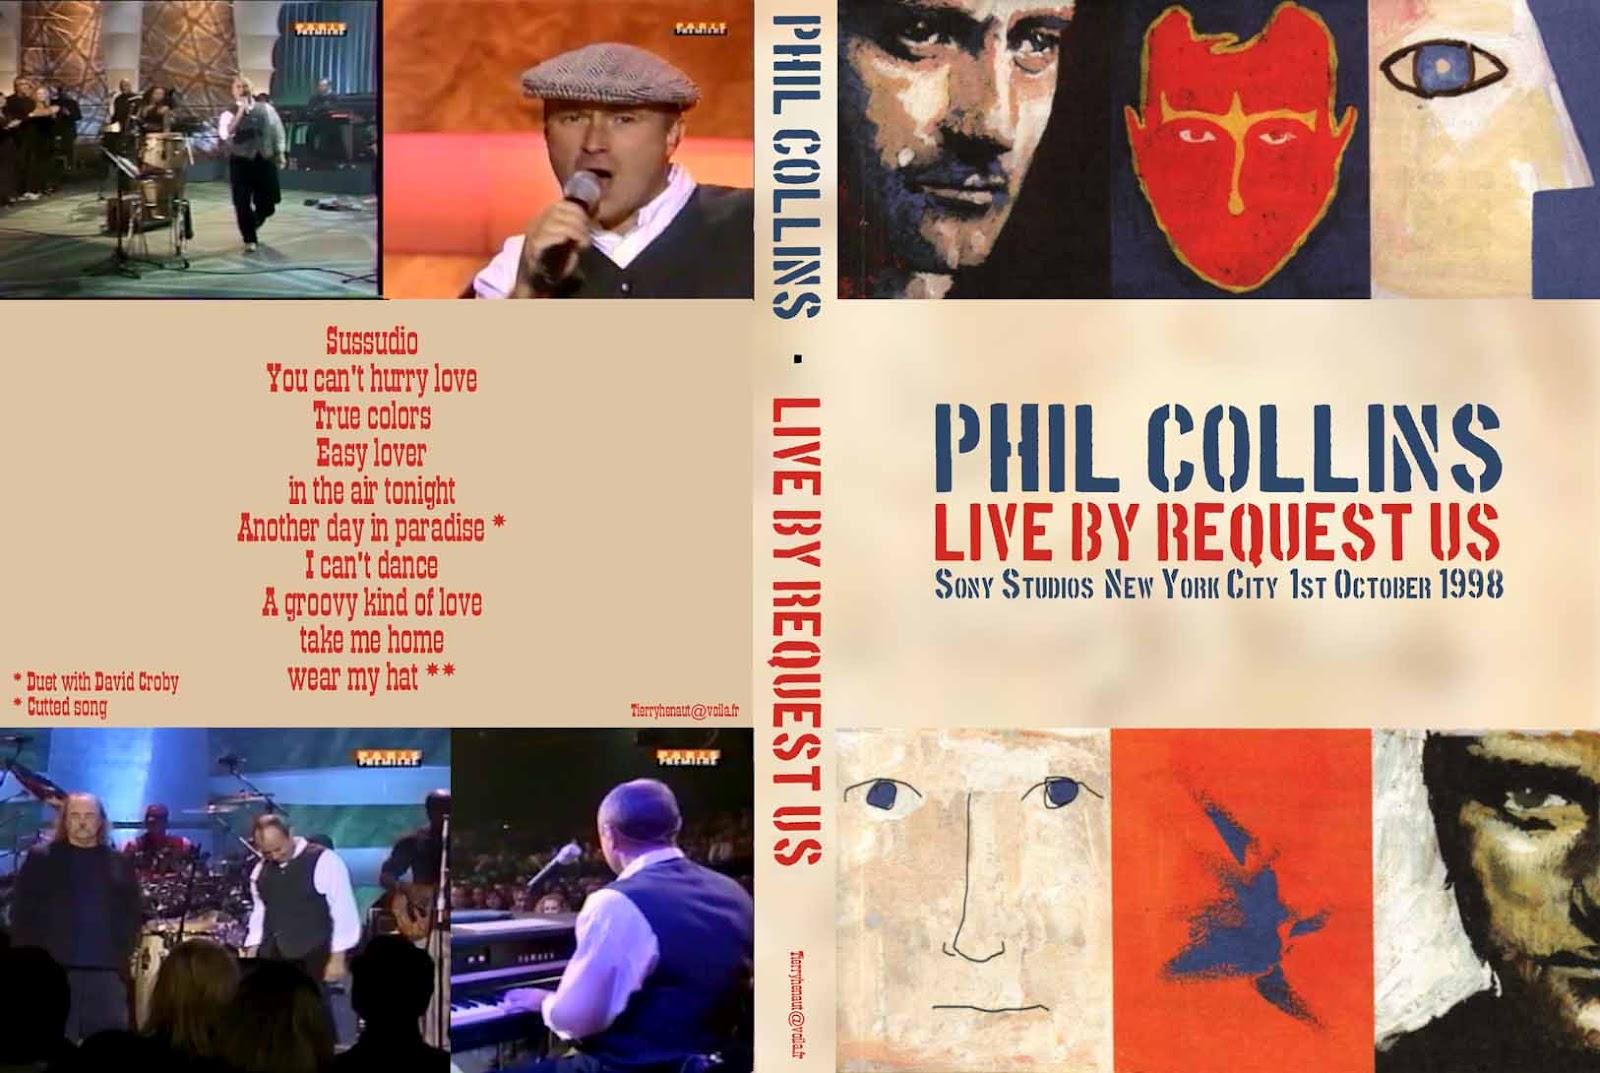 http://1.bp.blogspot.com/-cf3l7F3rYFY/T-k_GBC4waI/AAAAAAAAGds/pAncevxnUw0/s1600/DVD+Cover+-+Phil+Collins+-+Live+By+Request+1998.jpg